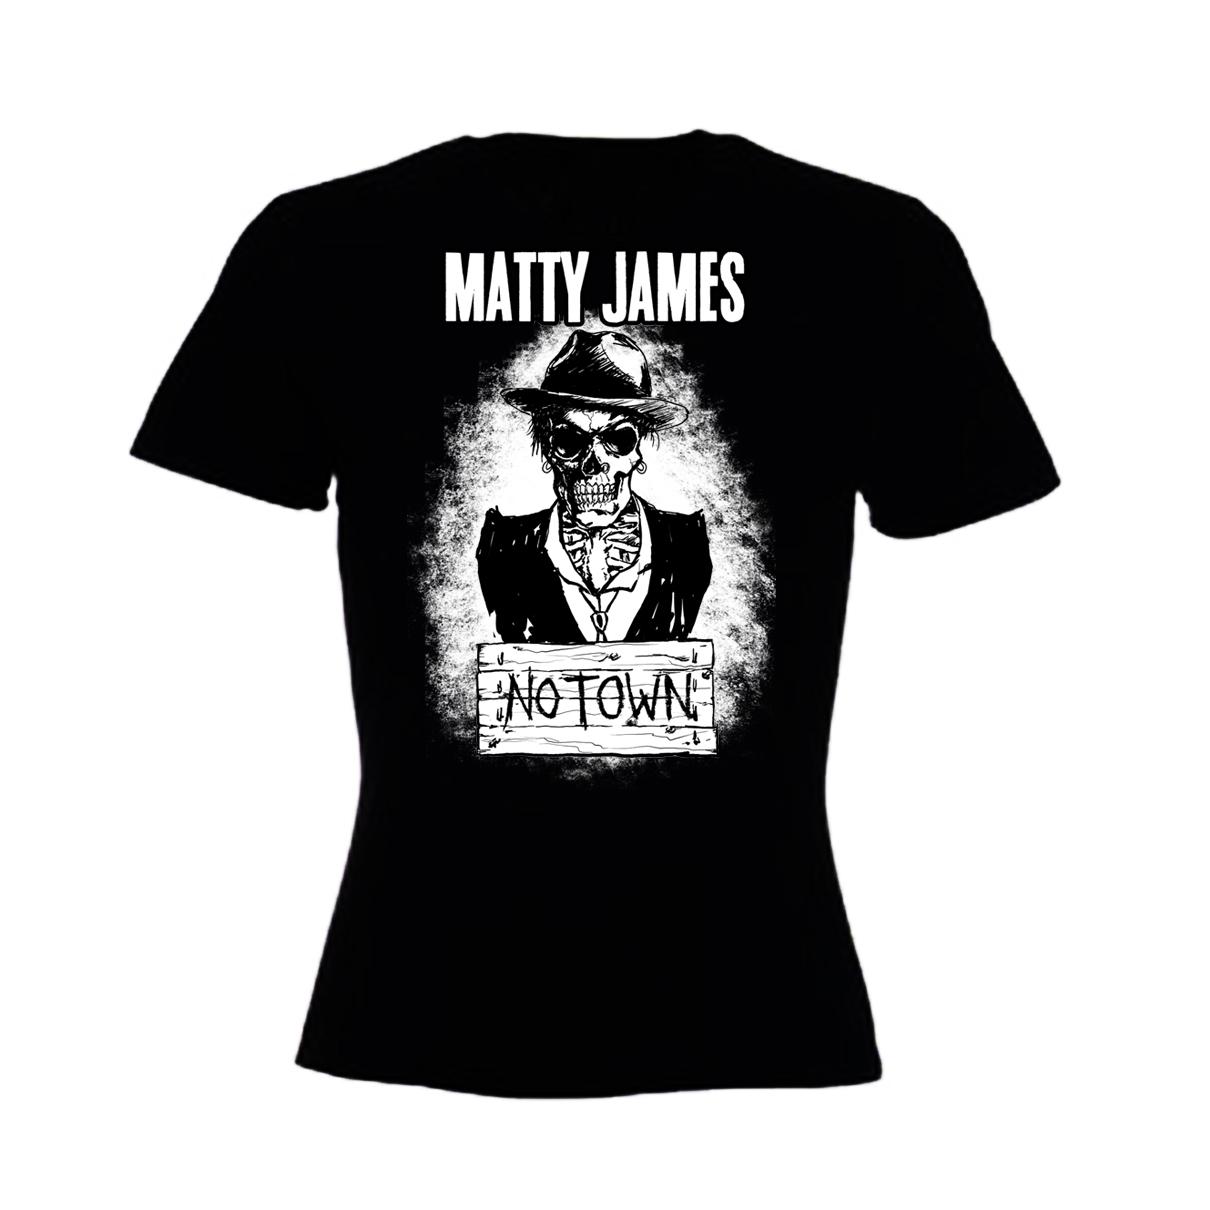 Matty James - The Road To No Town T-Shirt (Girls Skinny)